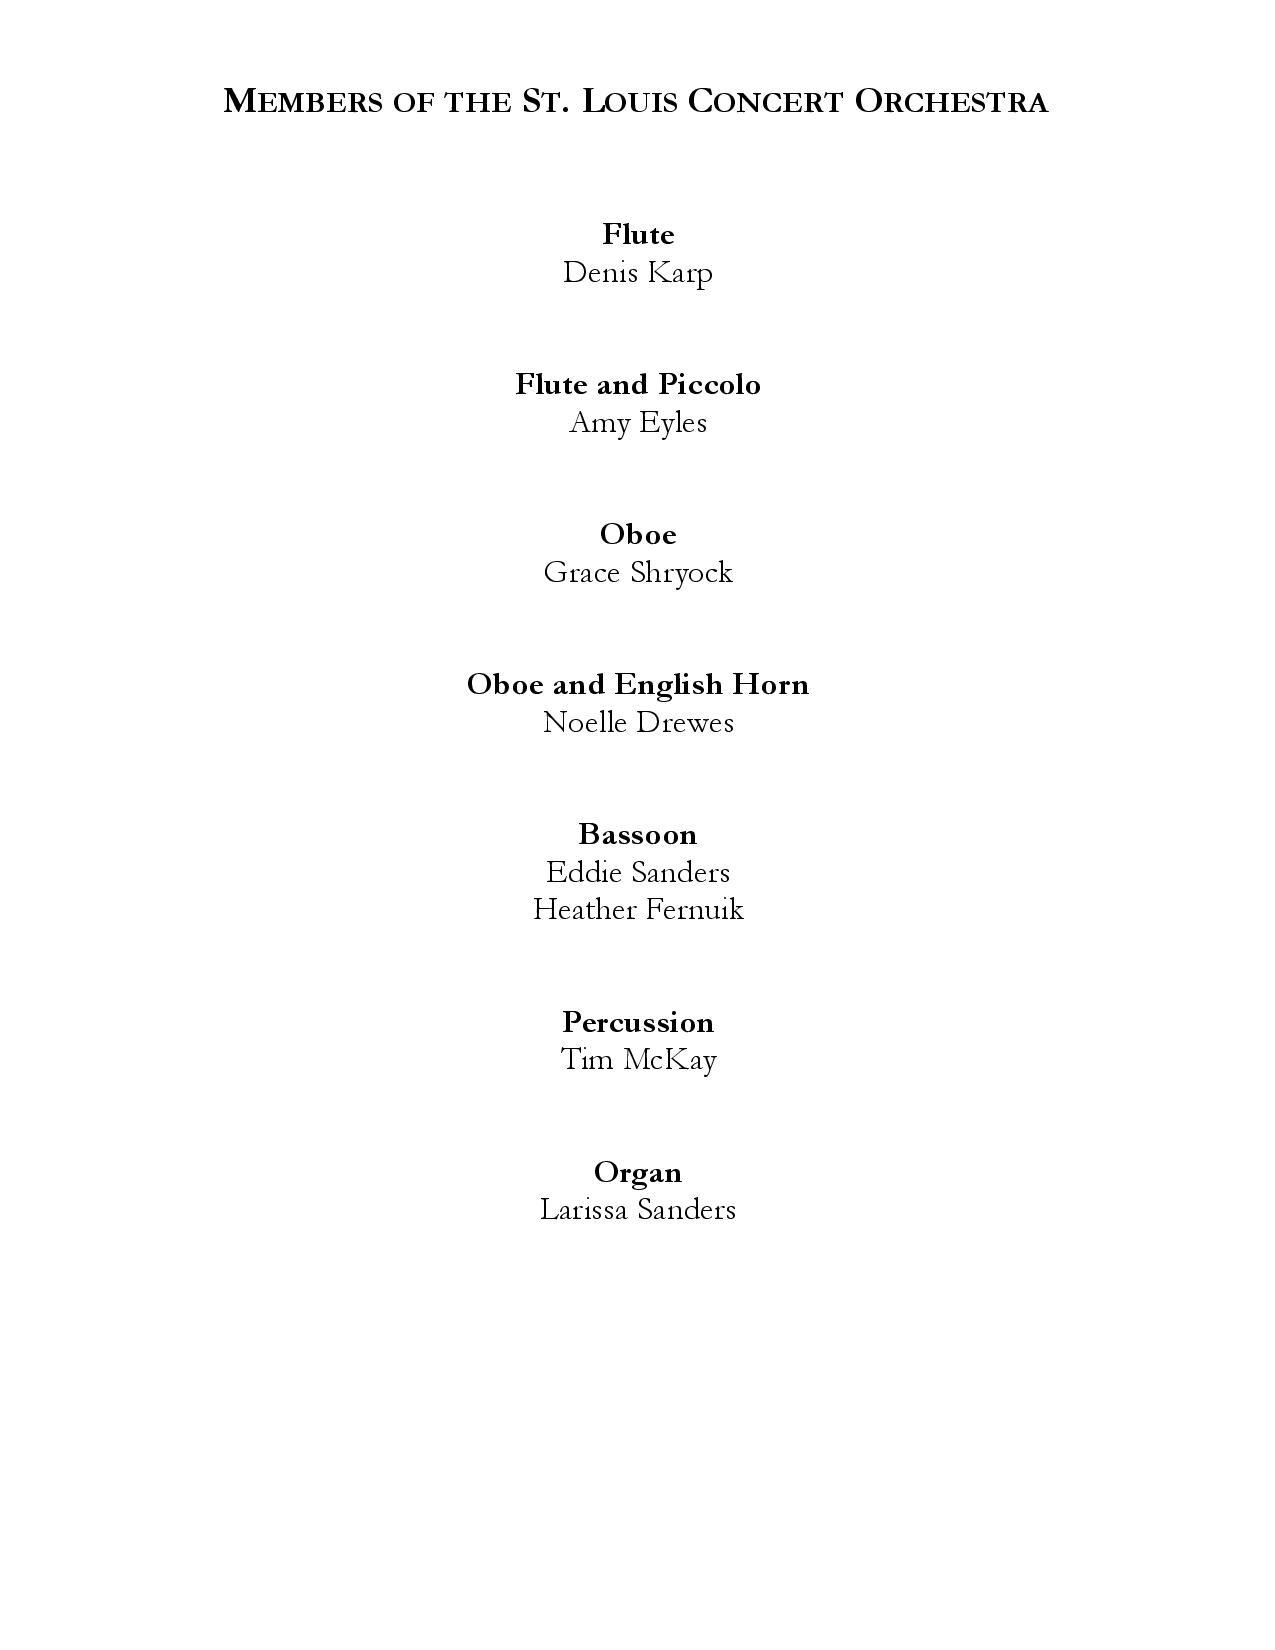 2012-12-16 Program Draft - 2012-12-11 v2-page-010.jpg